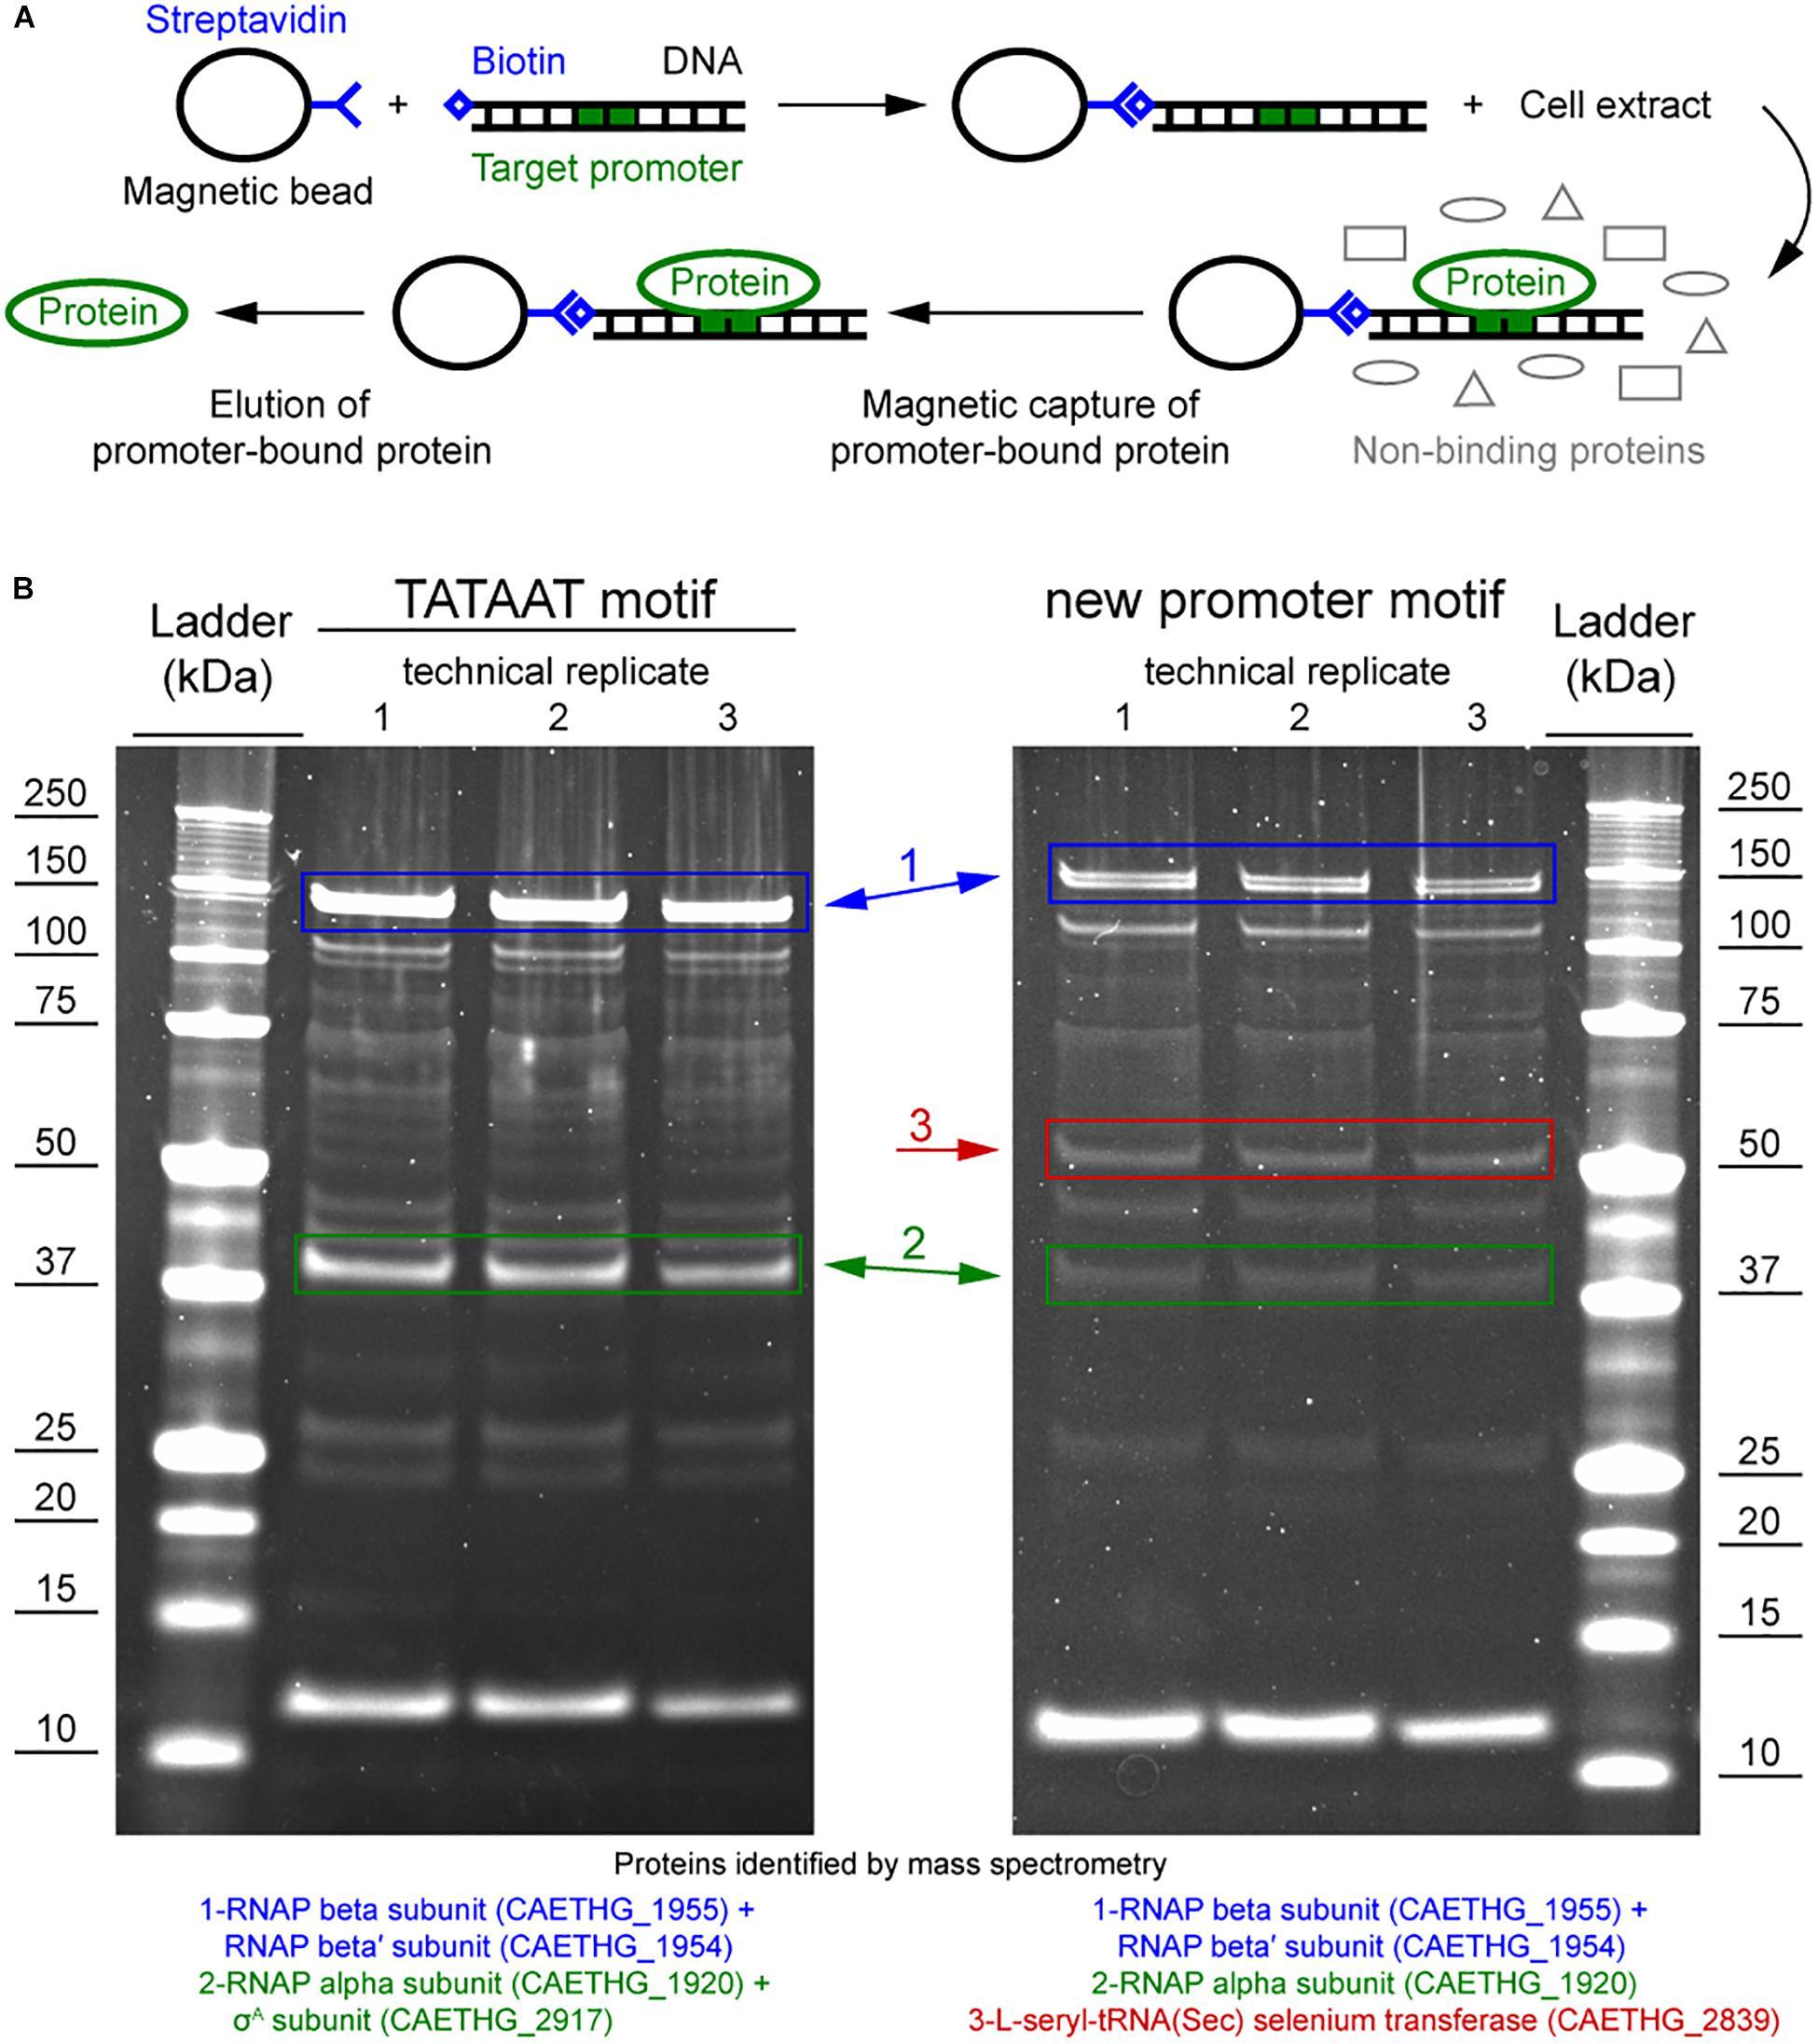 A TetR-Family Protein (CAETHG_0459) Activates